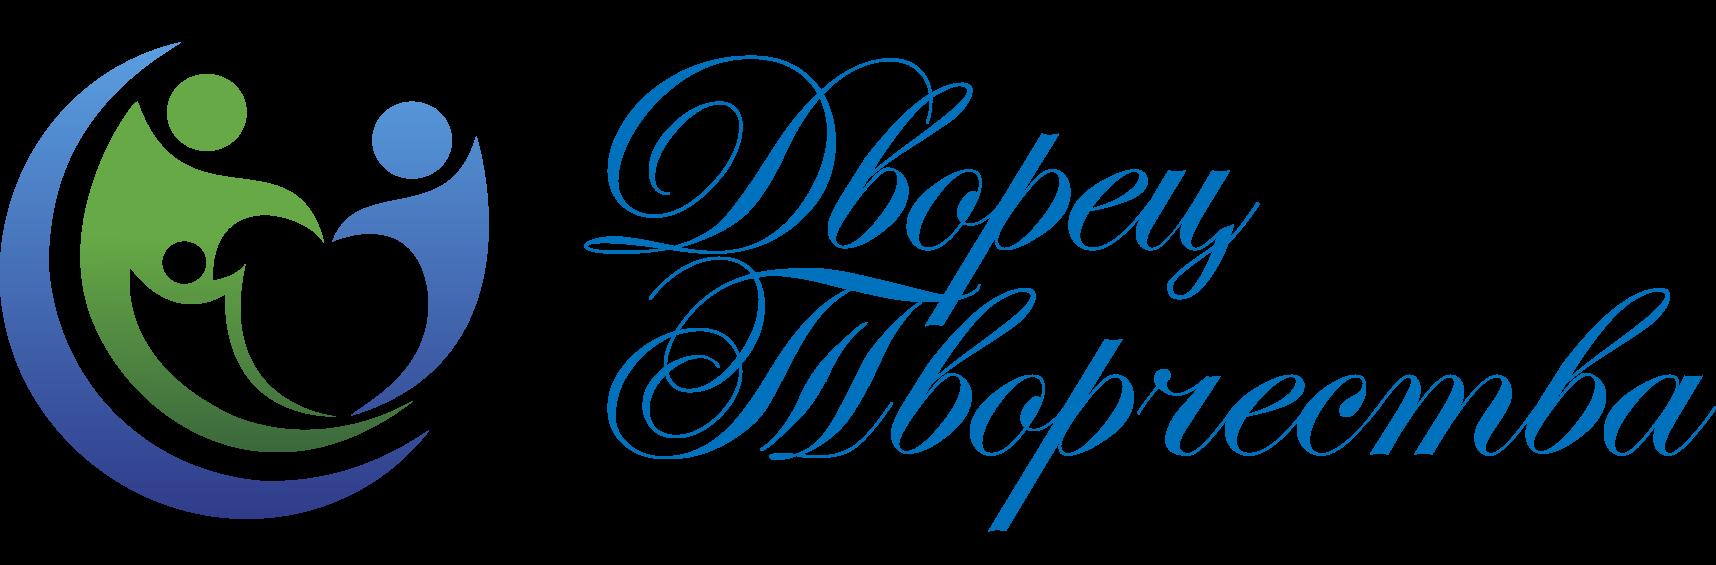 Дворец творчества | Официальный сайт МАУ ДО Дворец творчества МР Учалинский район РБ